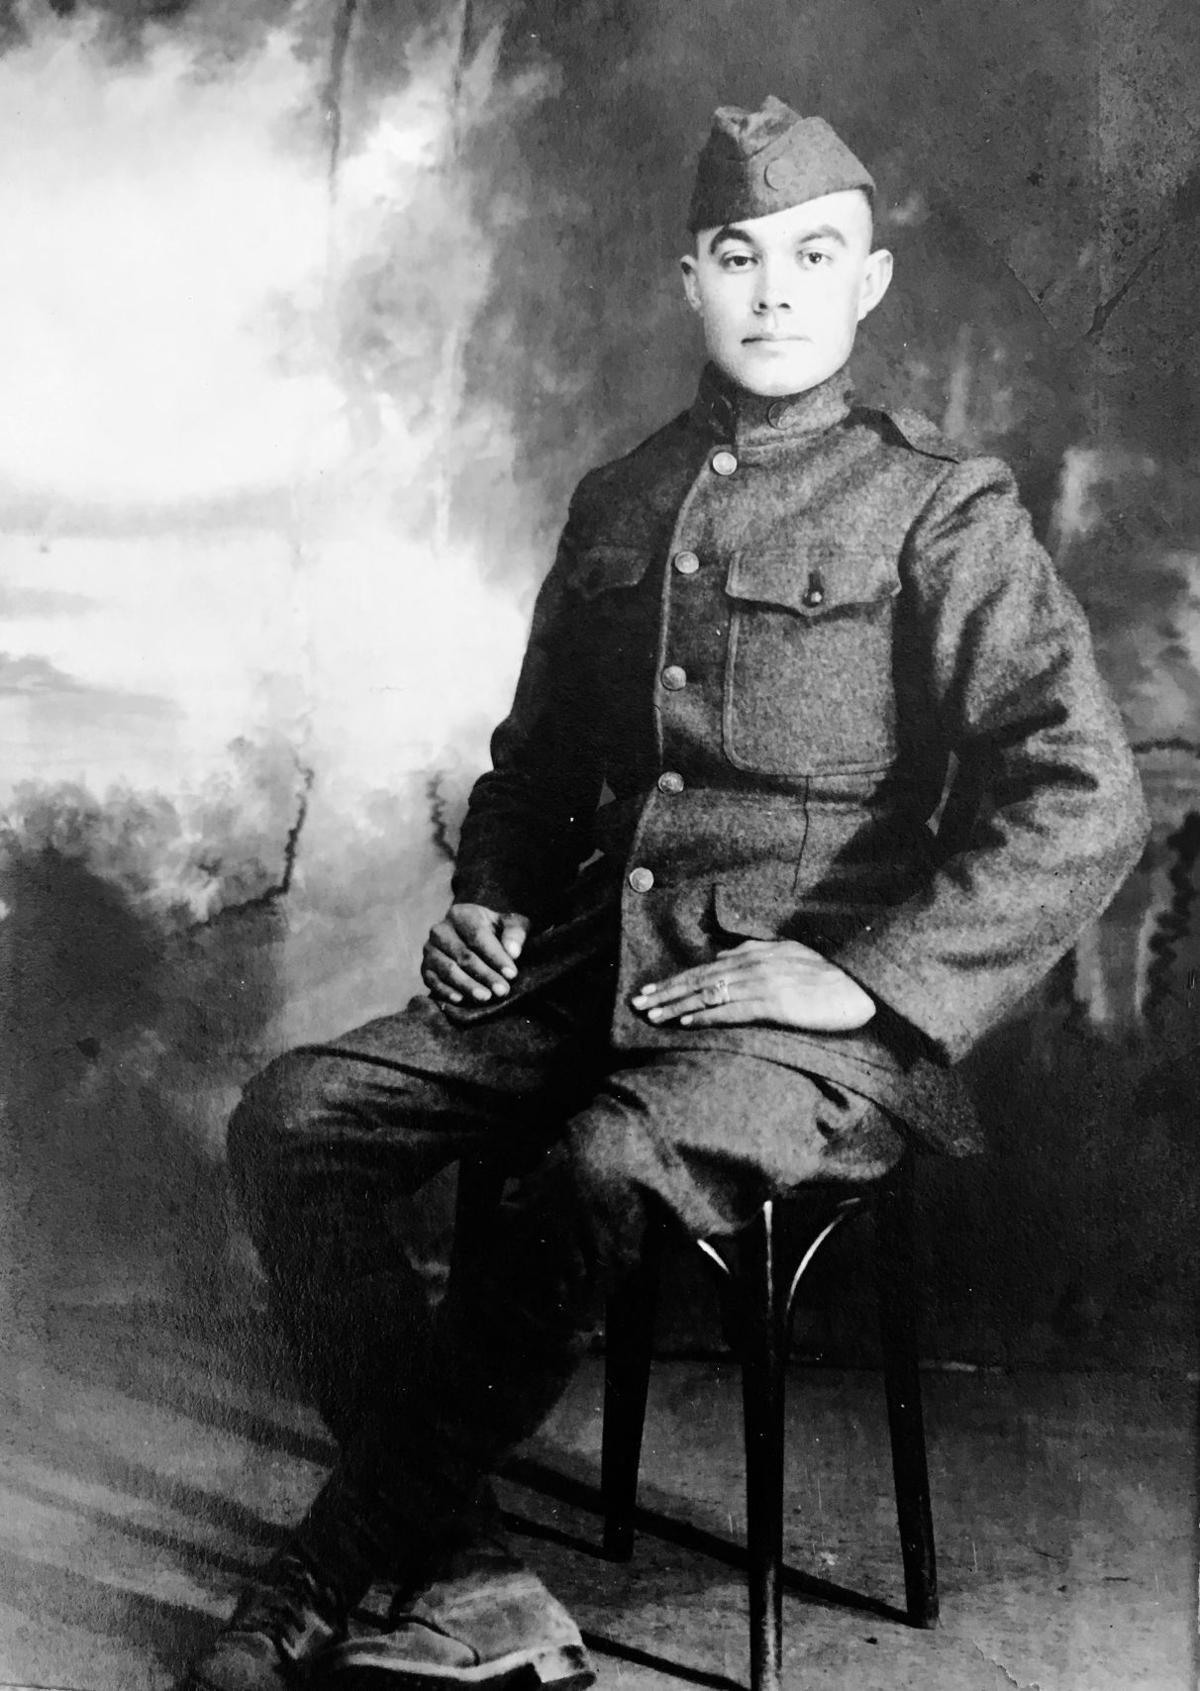 World War I centenary: Federico C. Carrillo